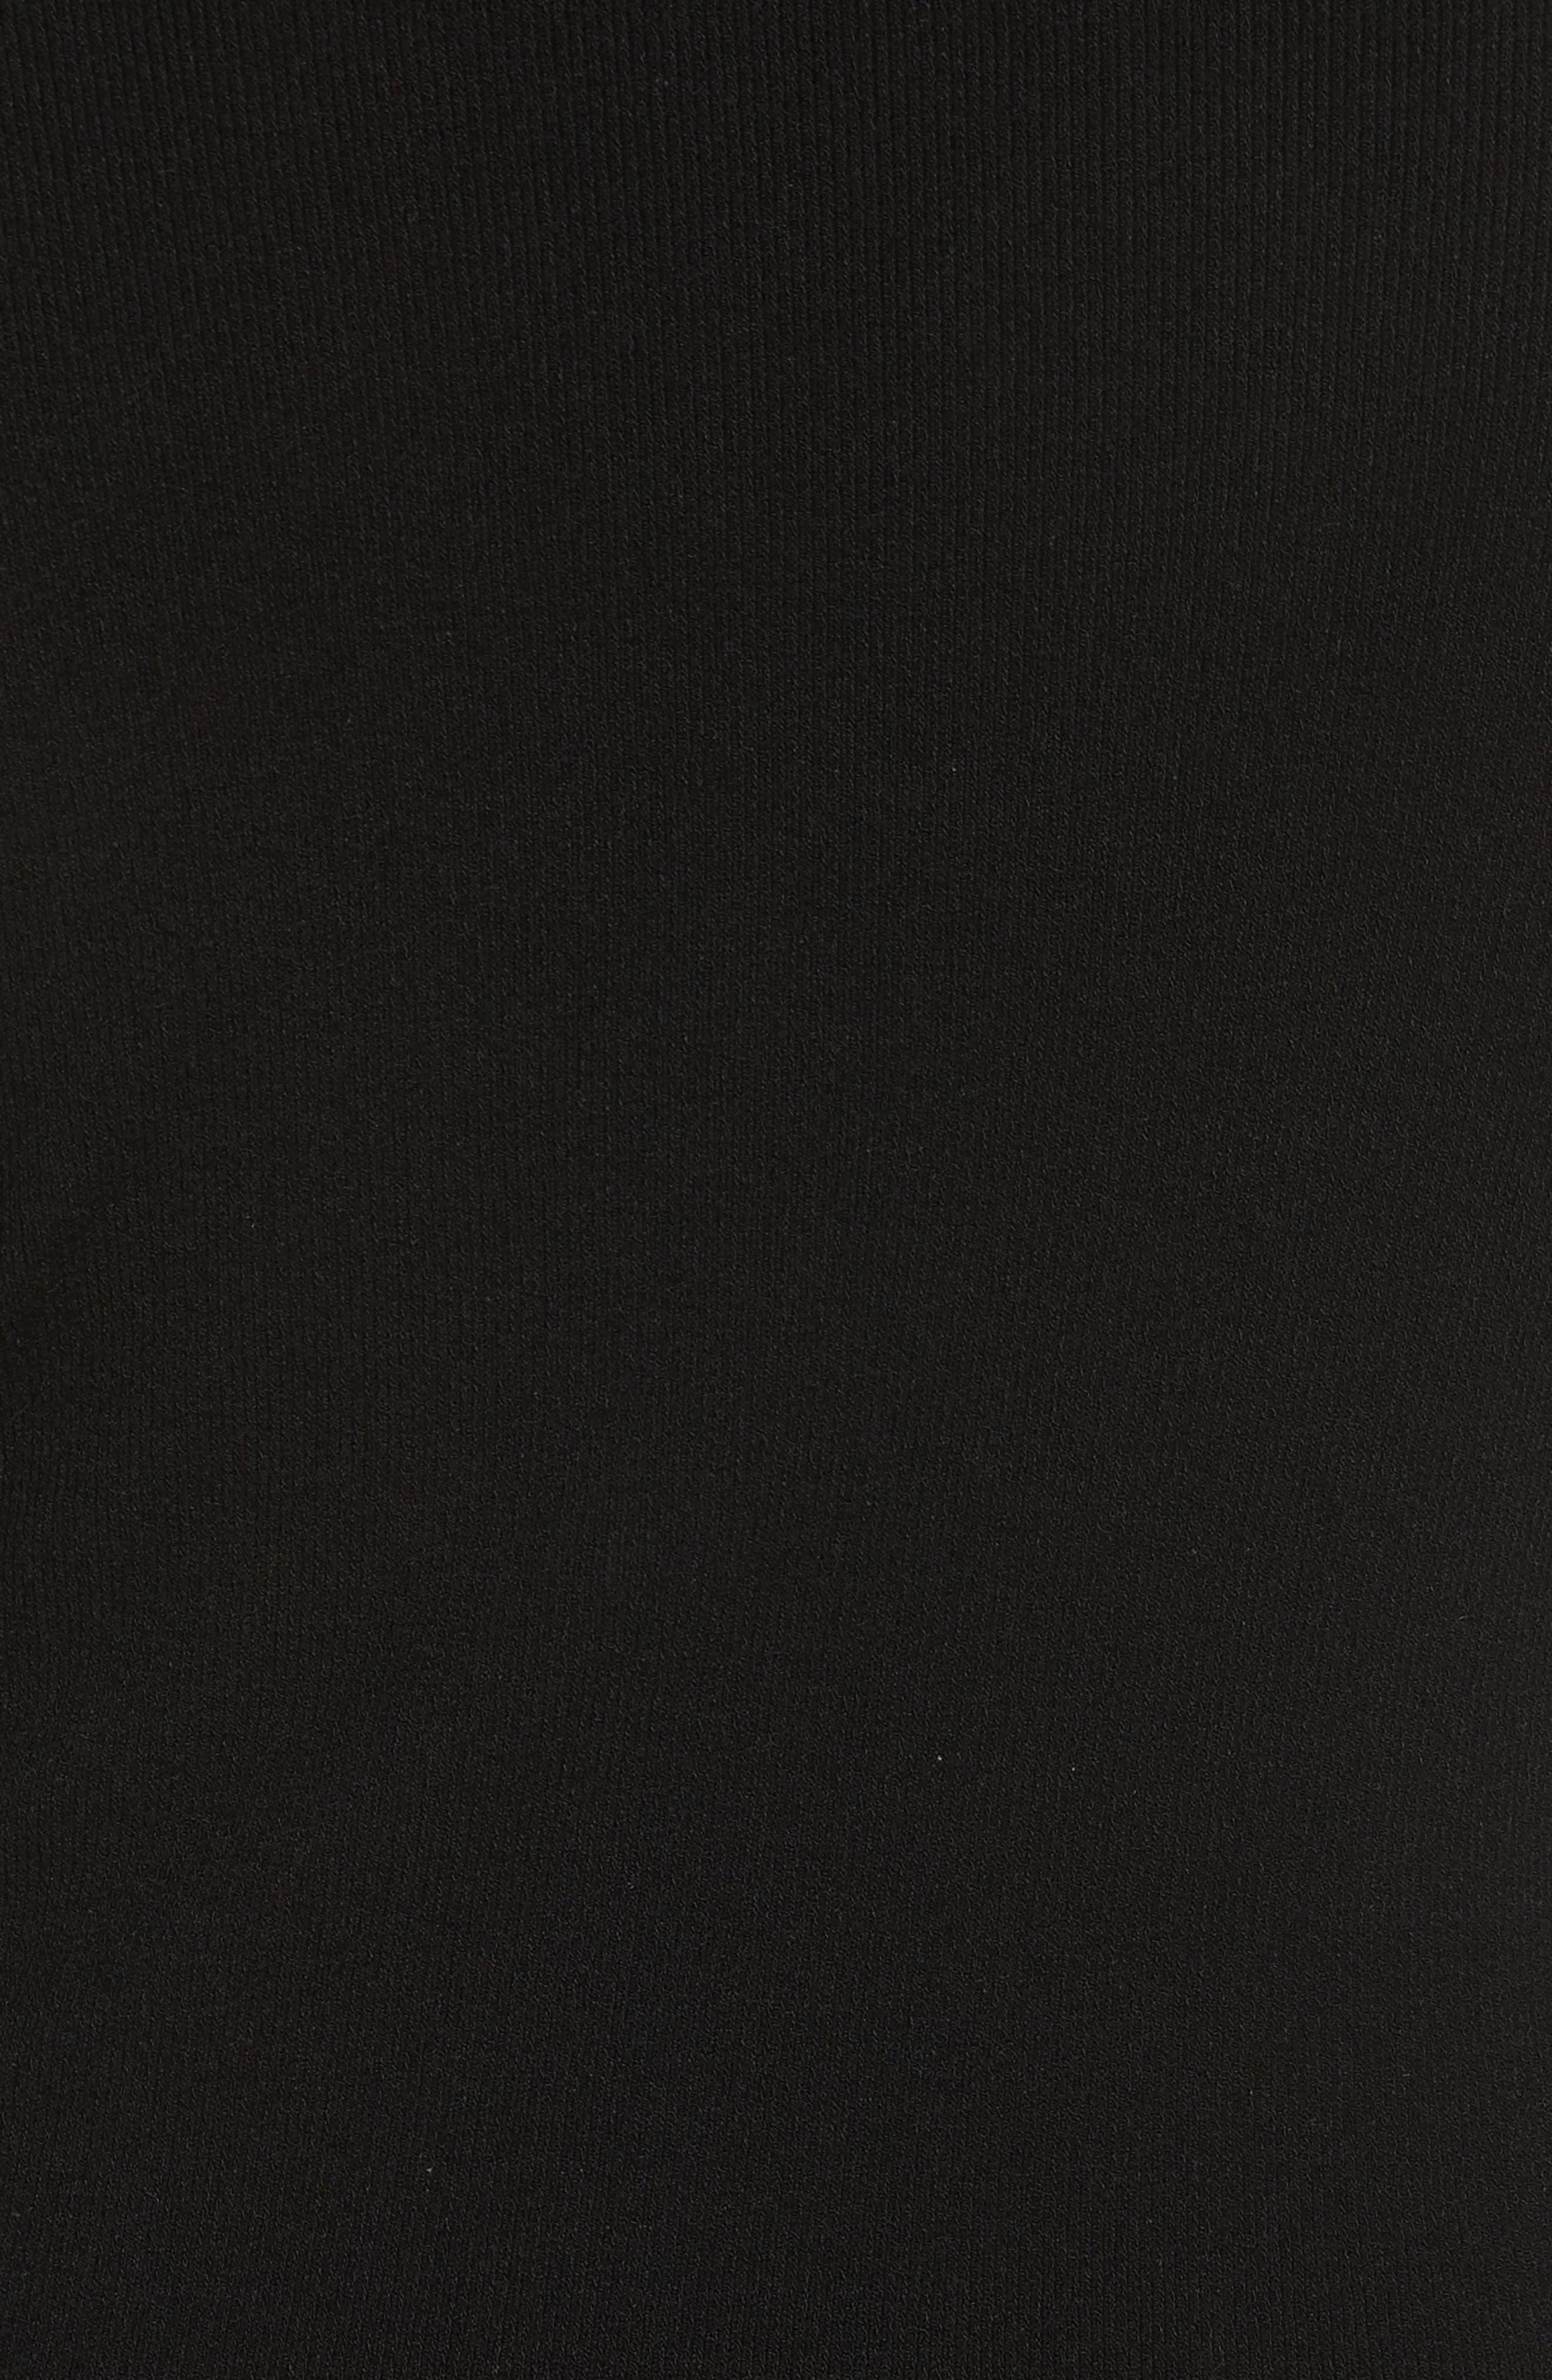 Camden Cutout Turtleneck Sweater,                             Alternate thumbnail 5, color,                             Black